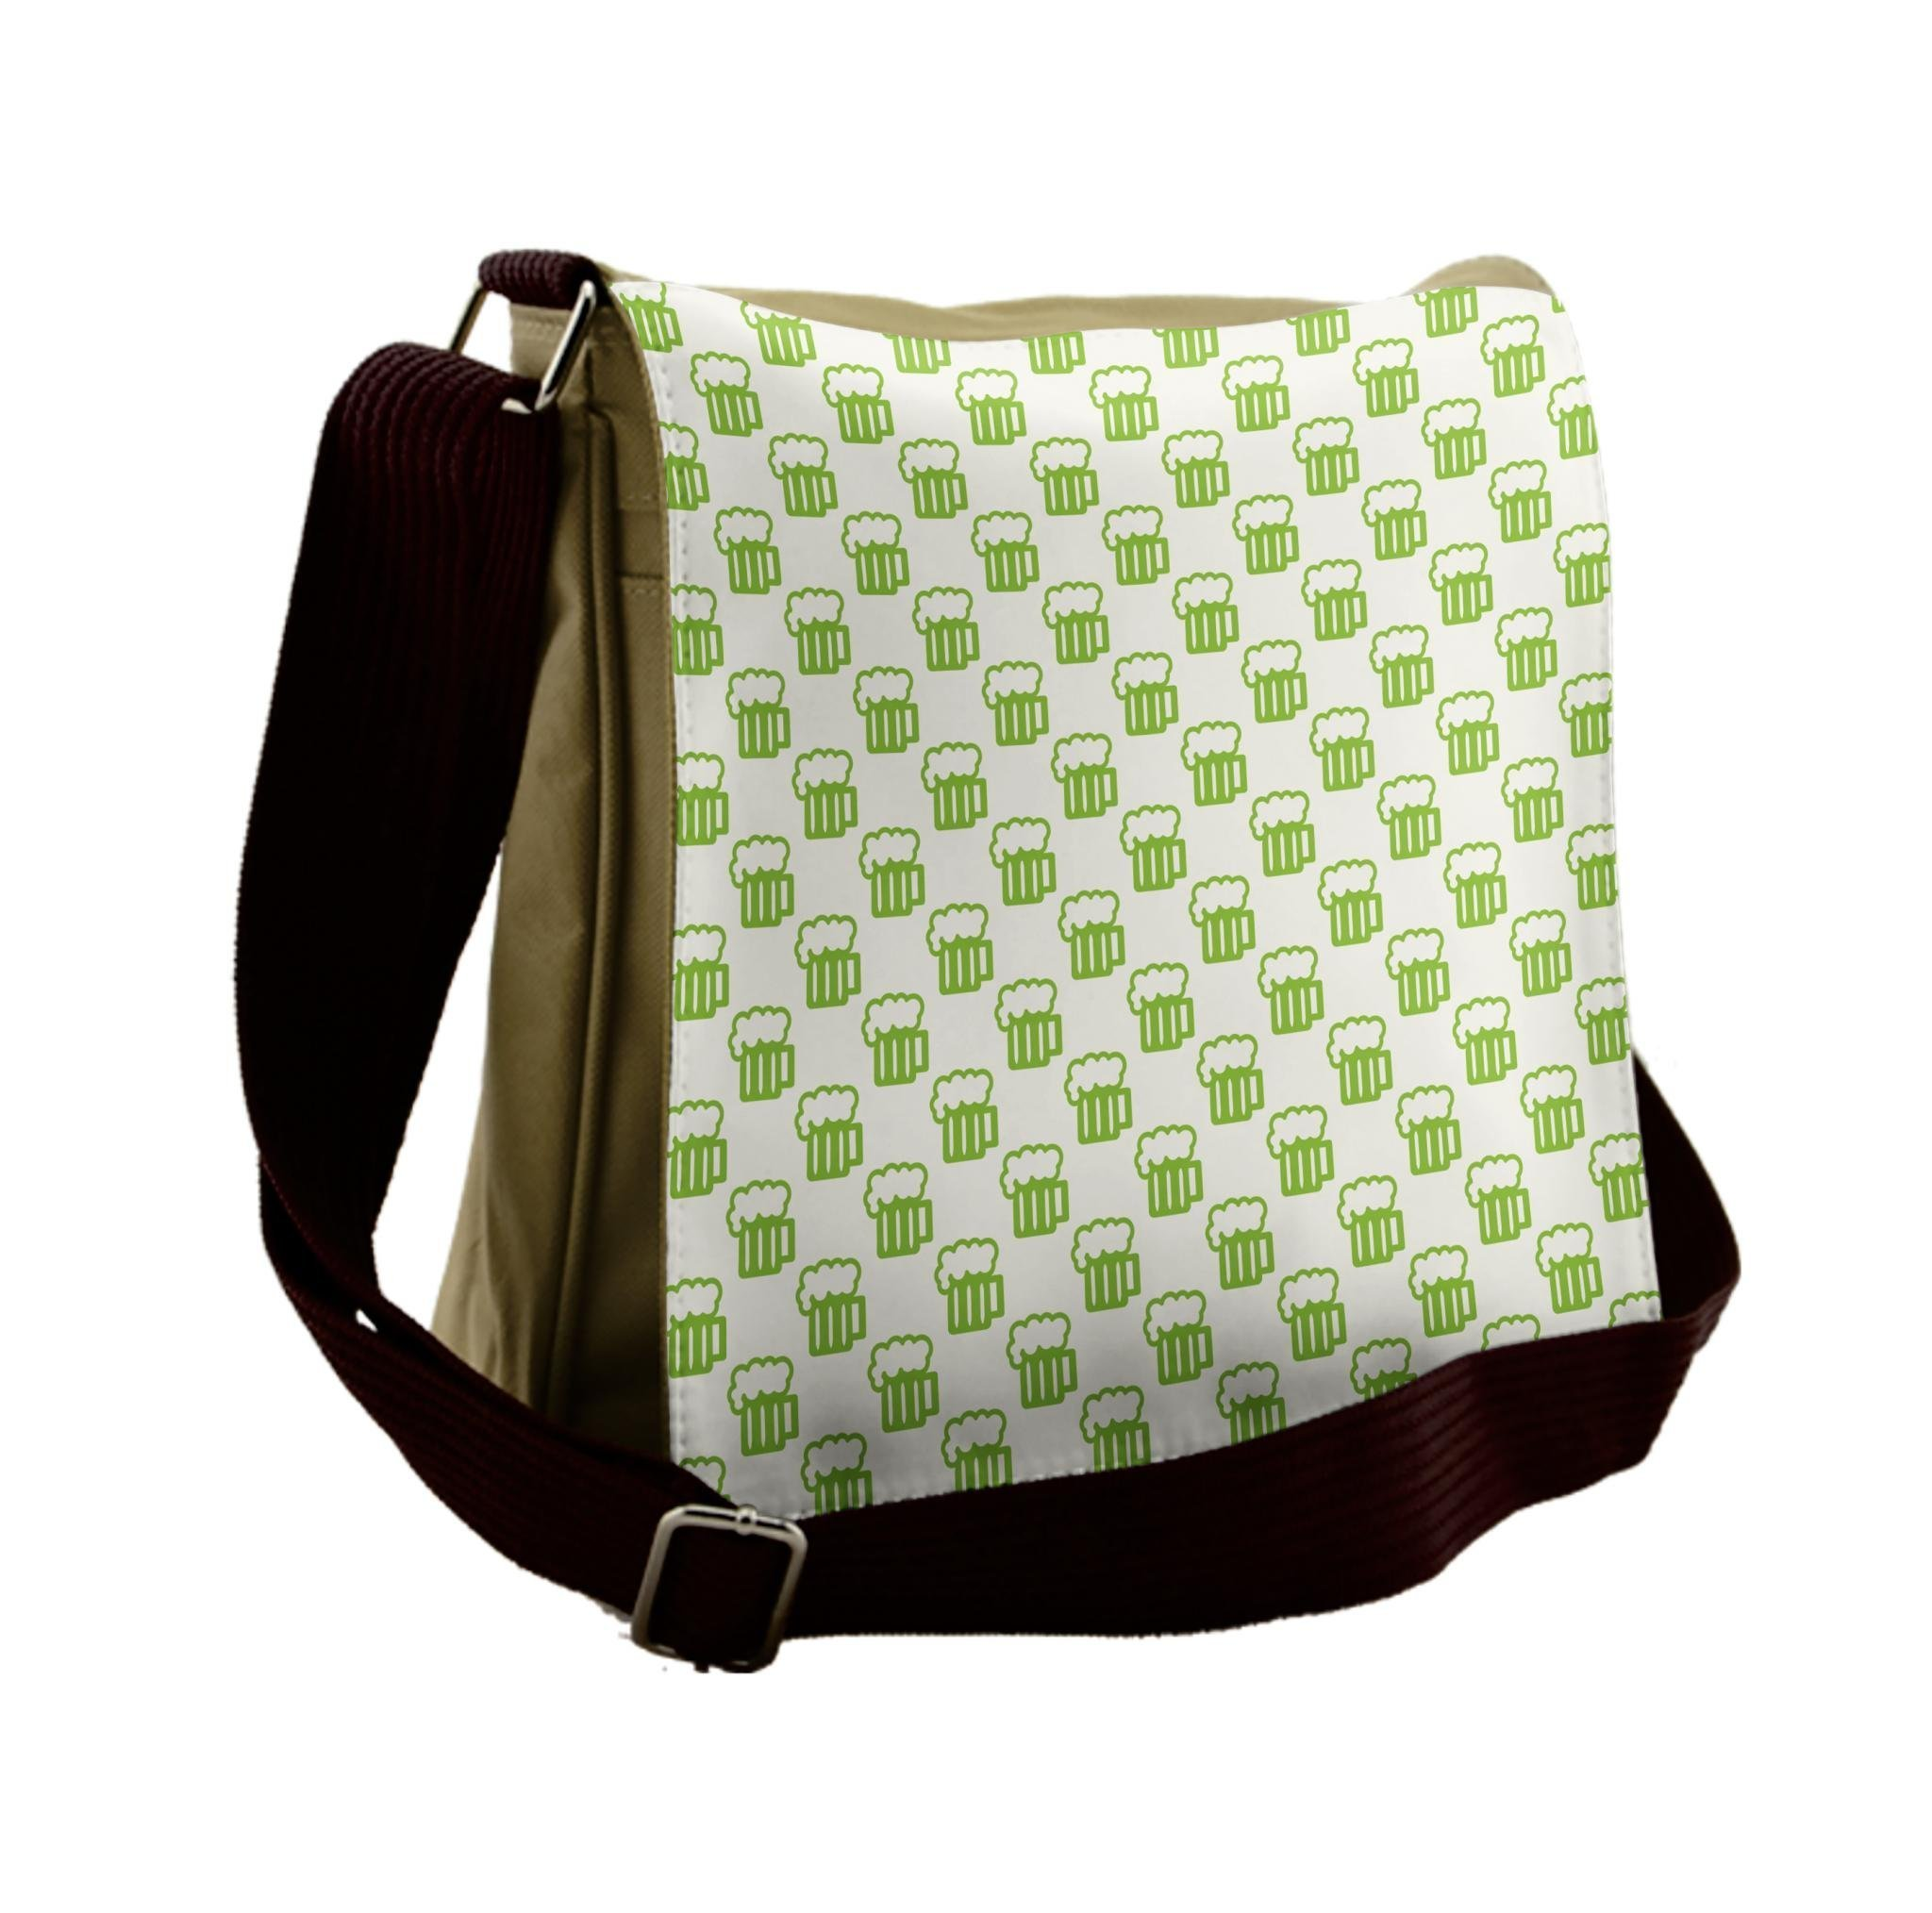 Ambesonne Green Messenger Bag, Foamy Cute Beer Glasses, Unisex Cross-body